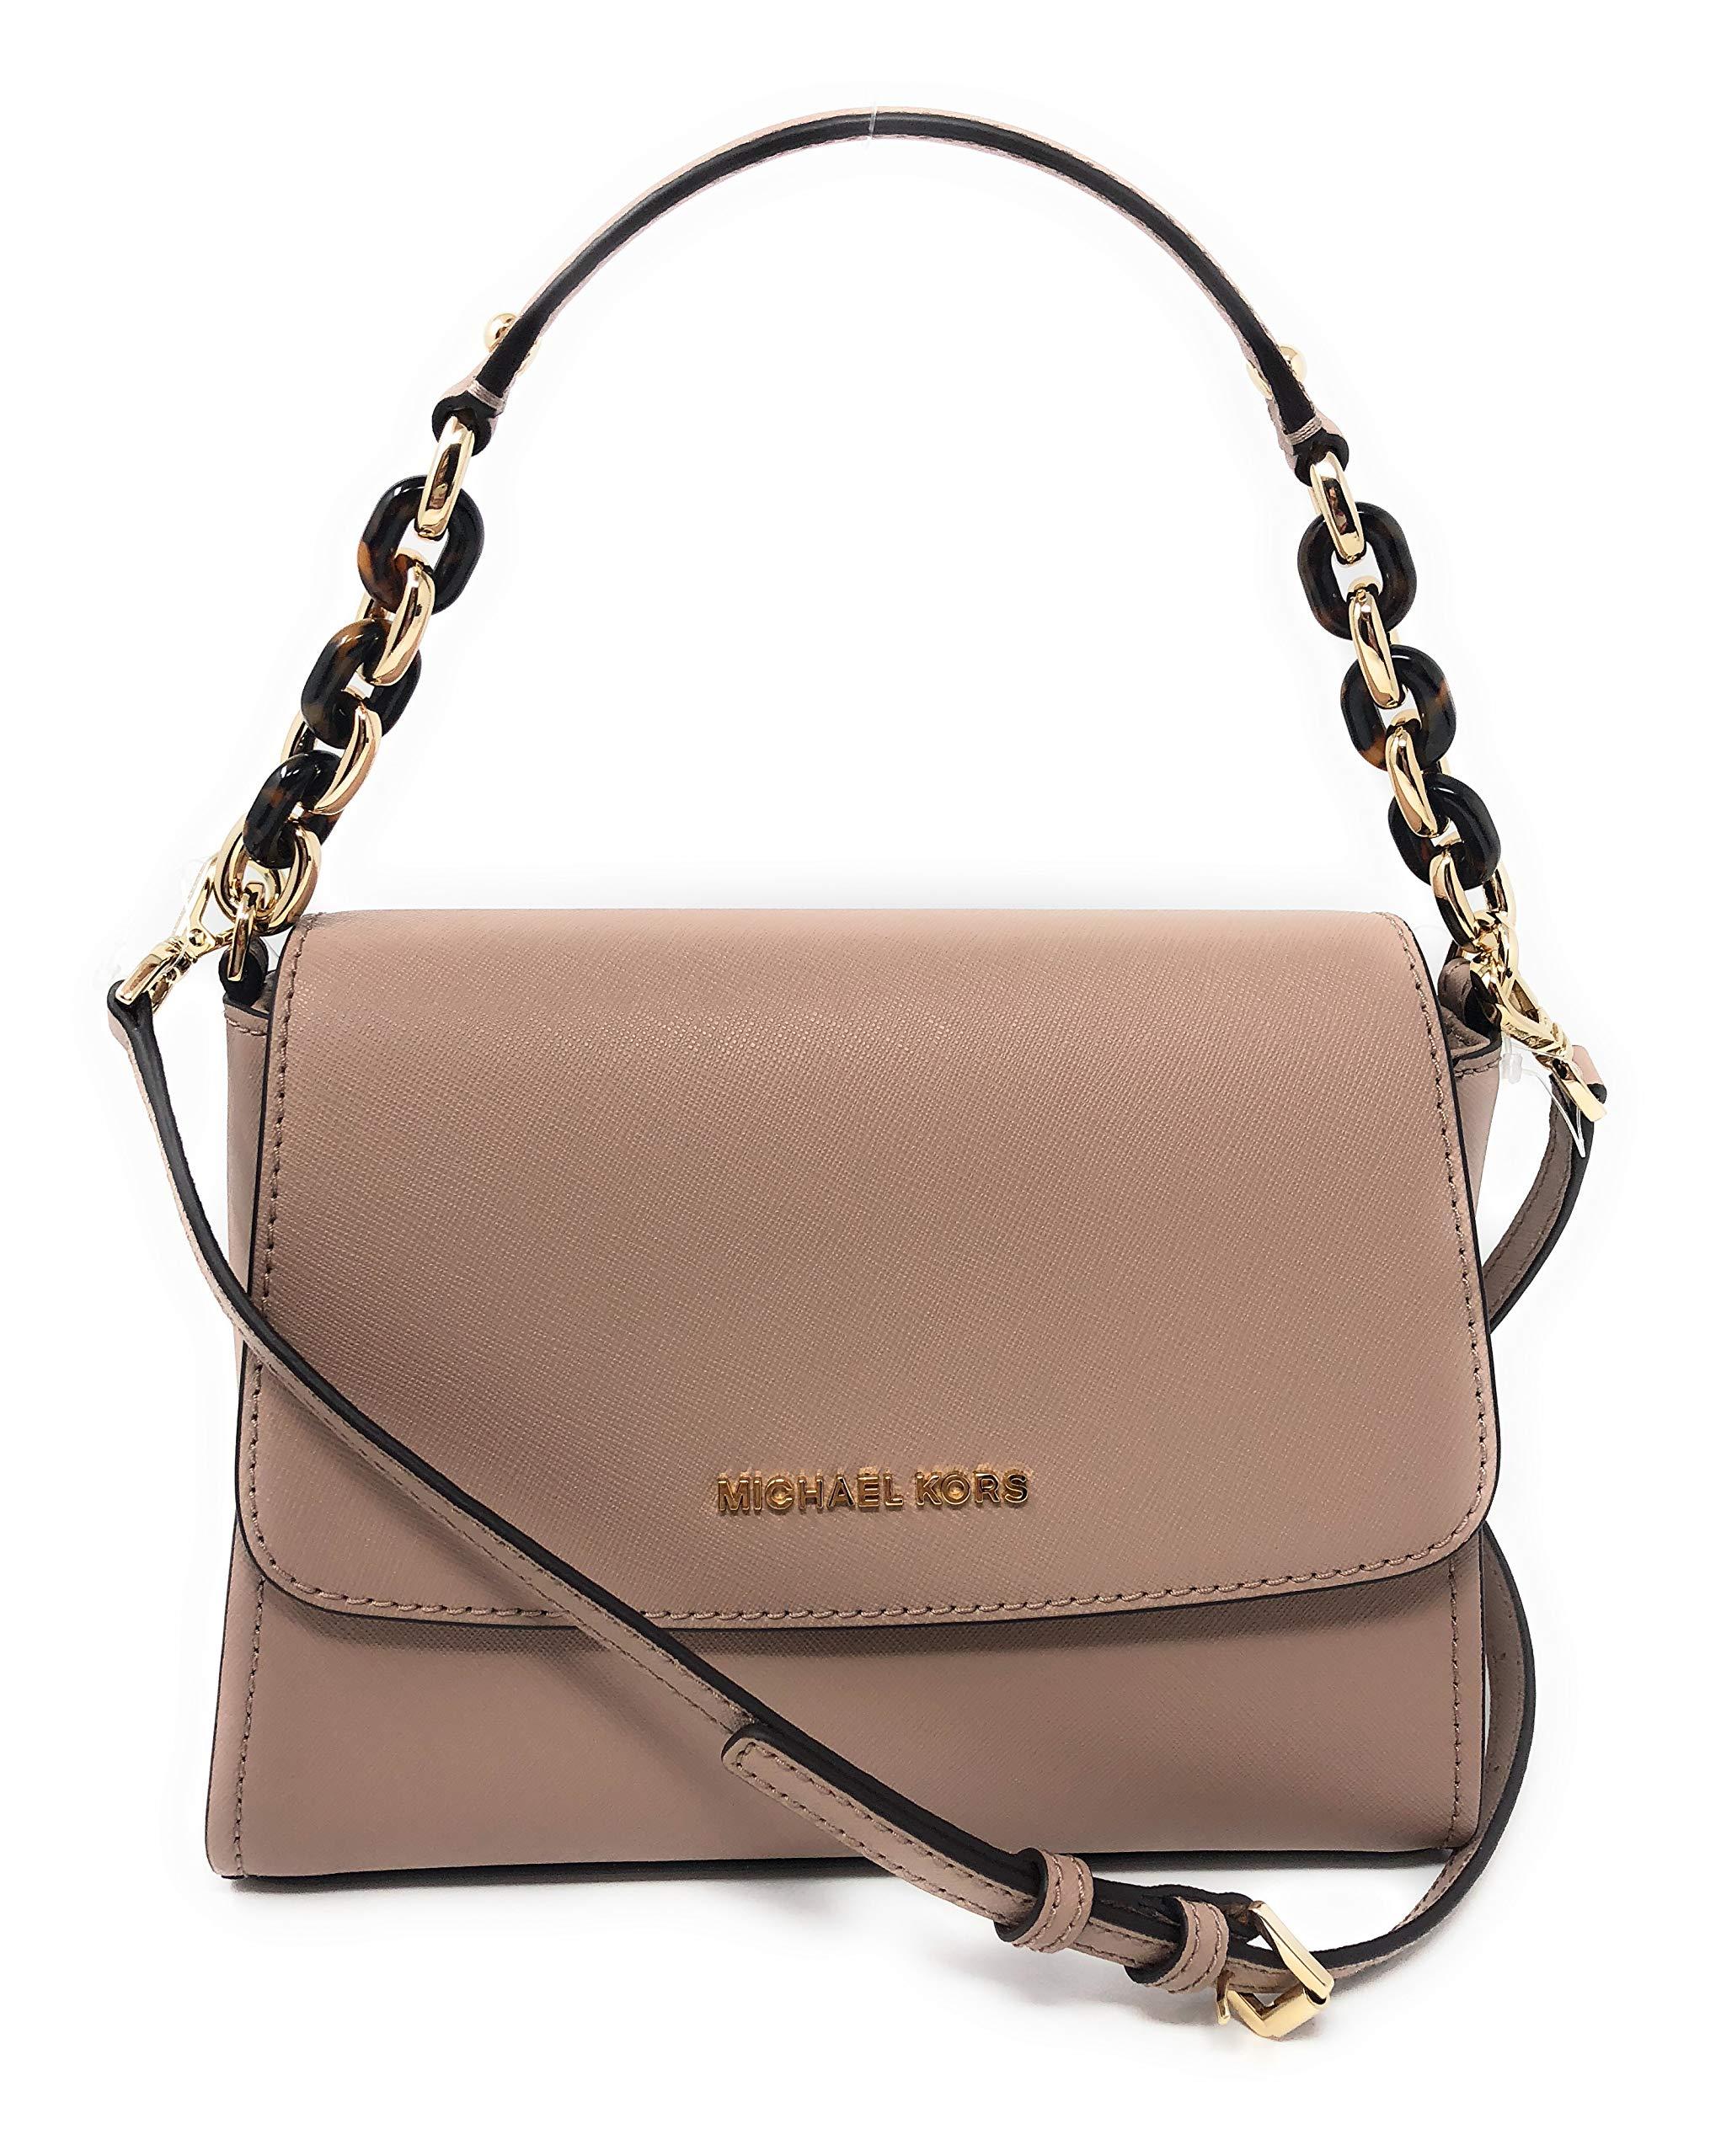 Michael Kors Sofia Small East West Saffiano Leather Satchel Crossbody Bag (Fawn)